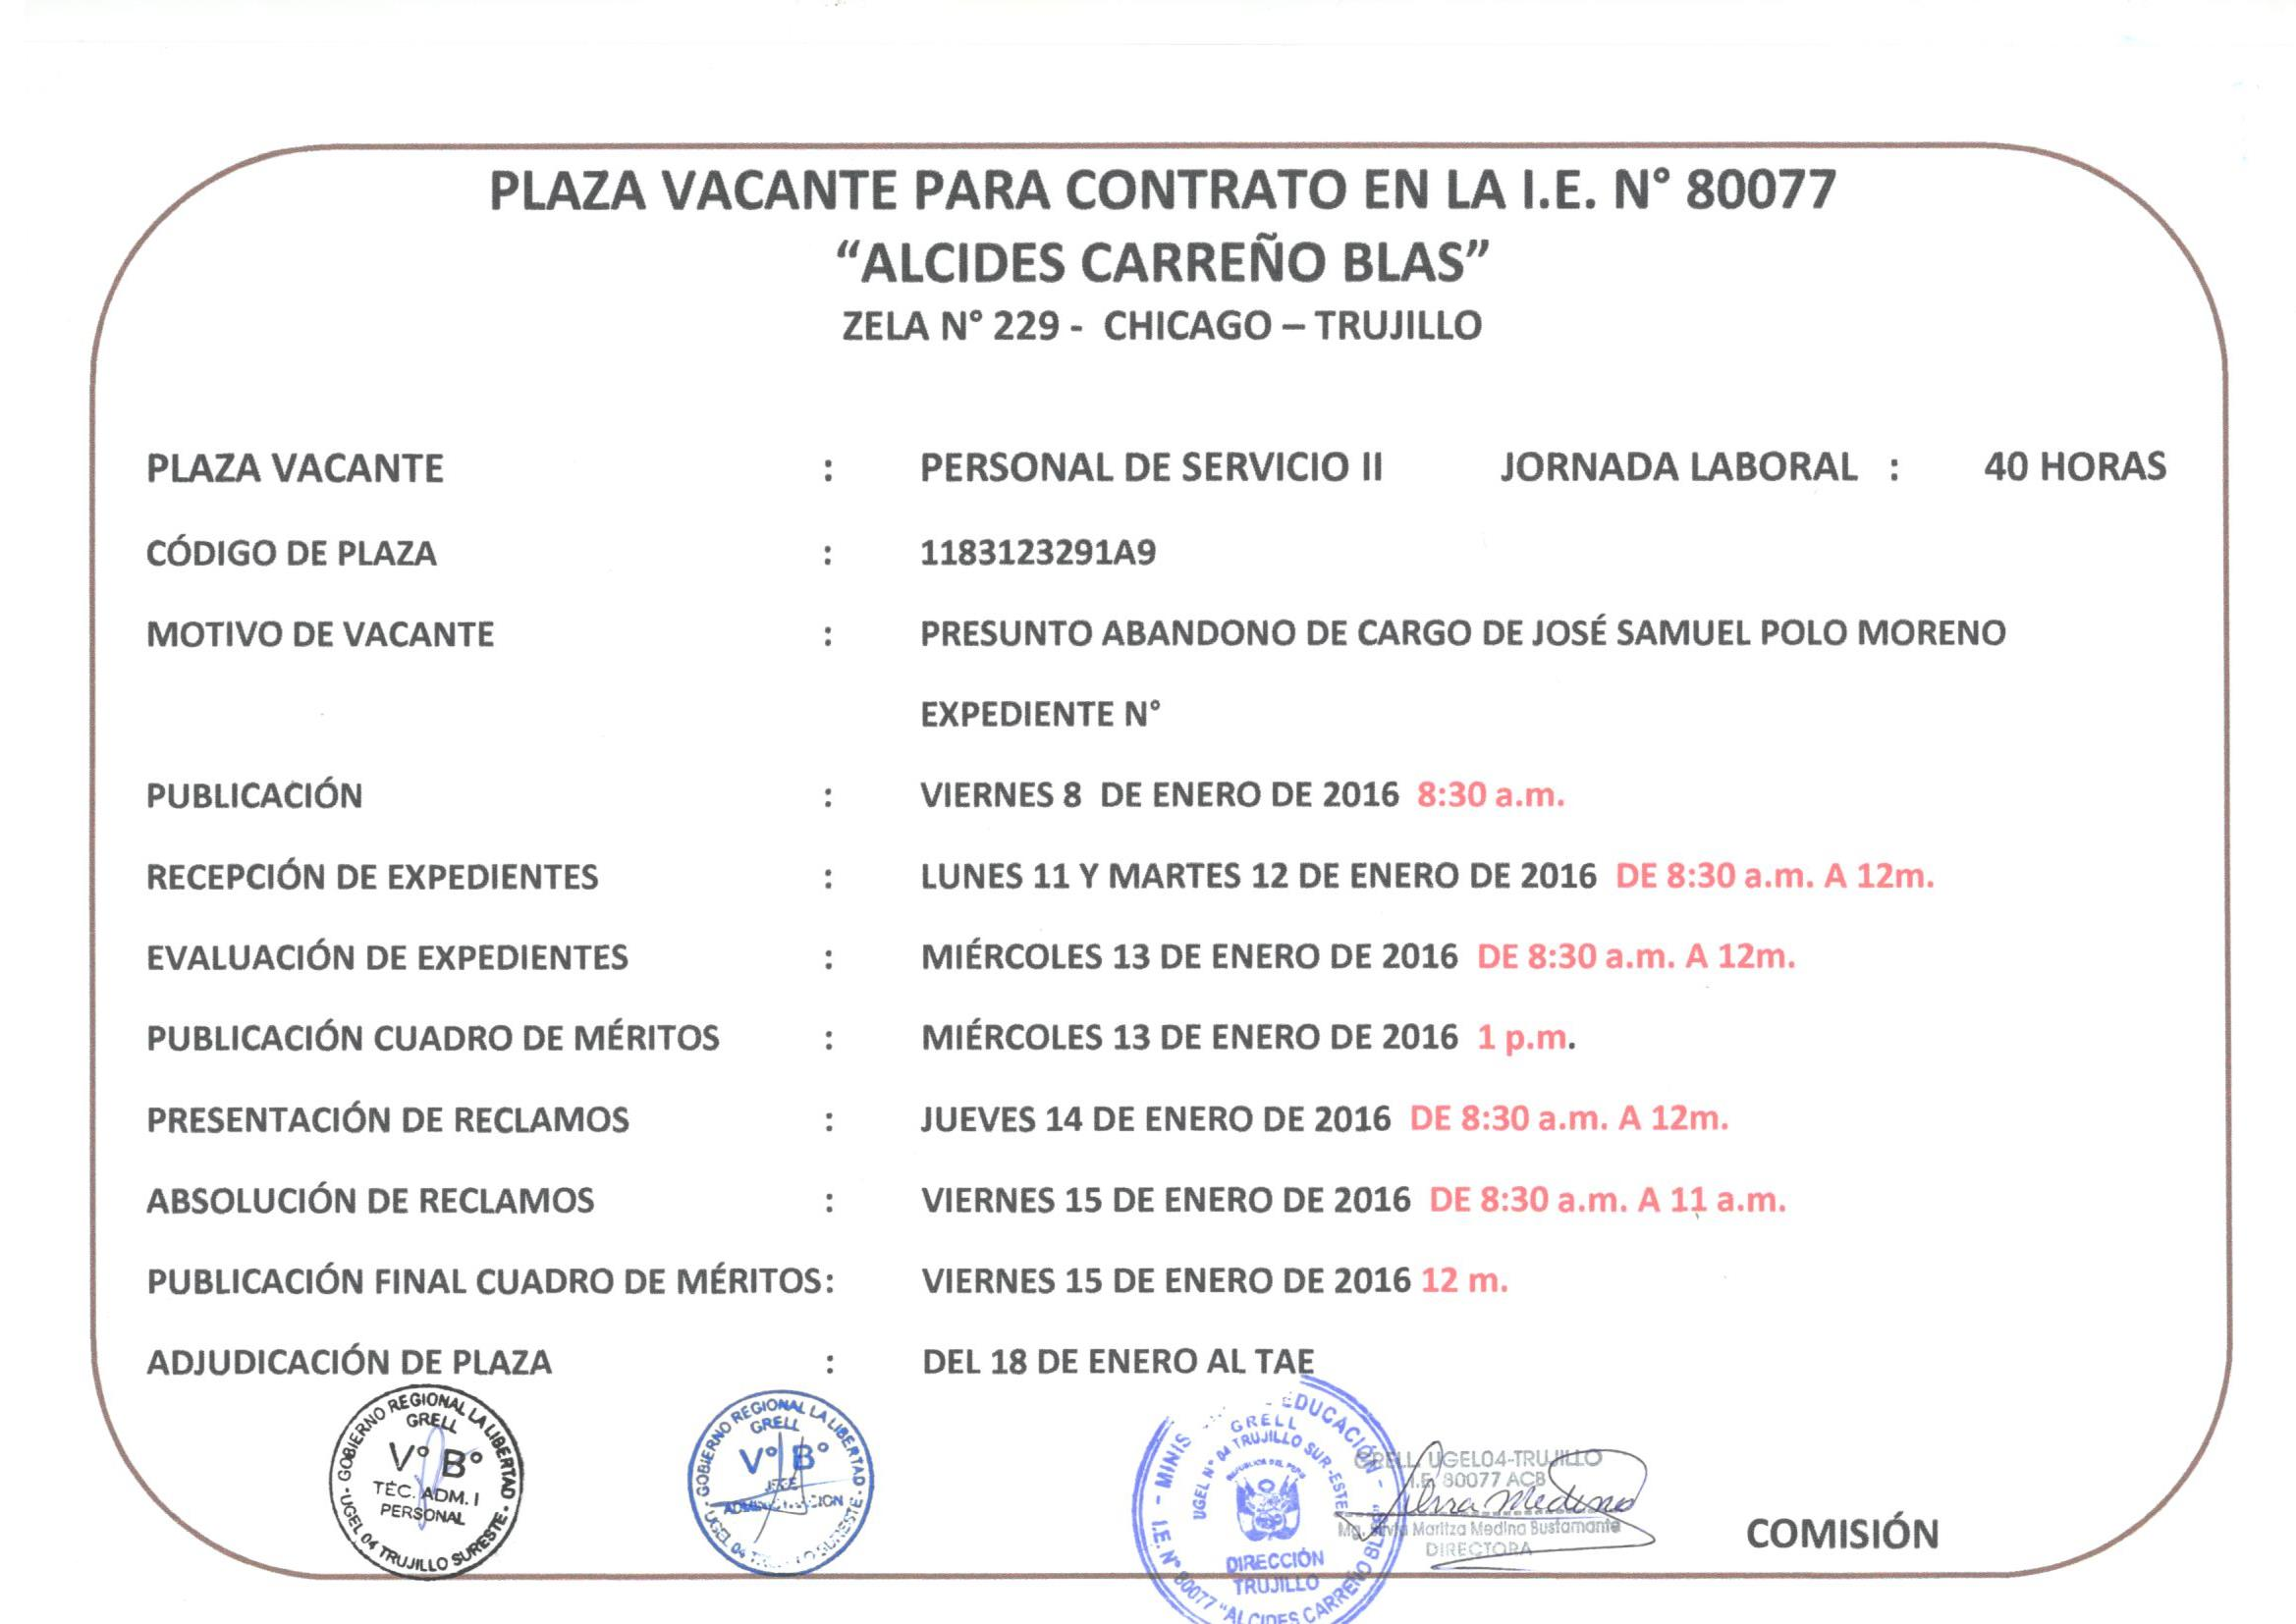 plaza vacante para contrato docente en la i e n 80077